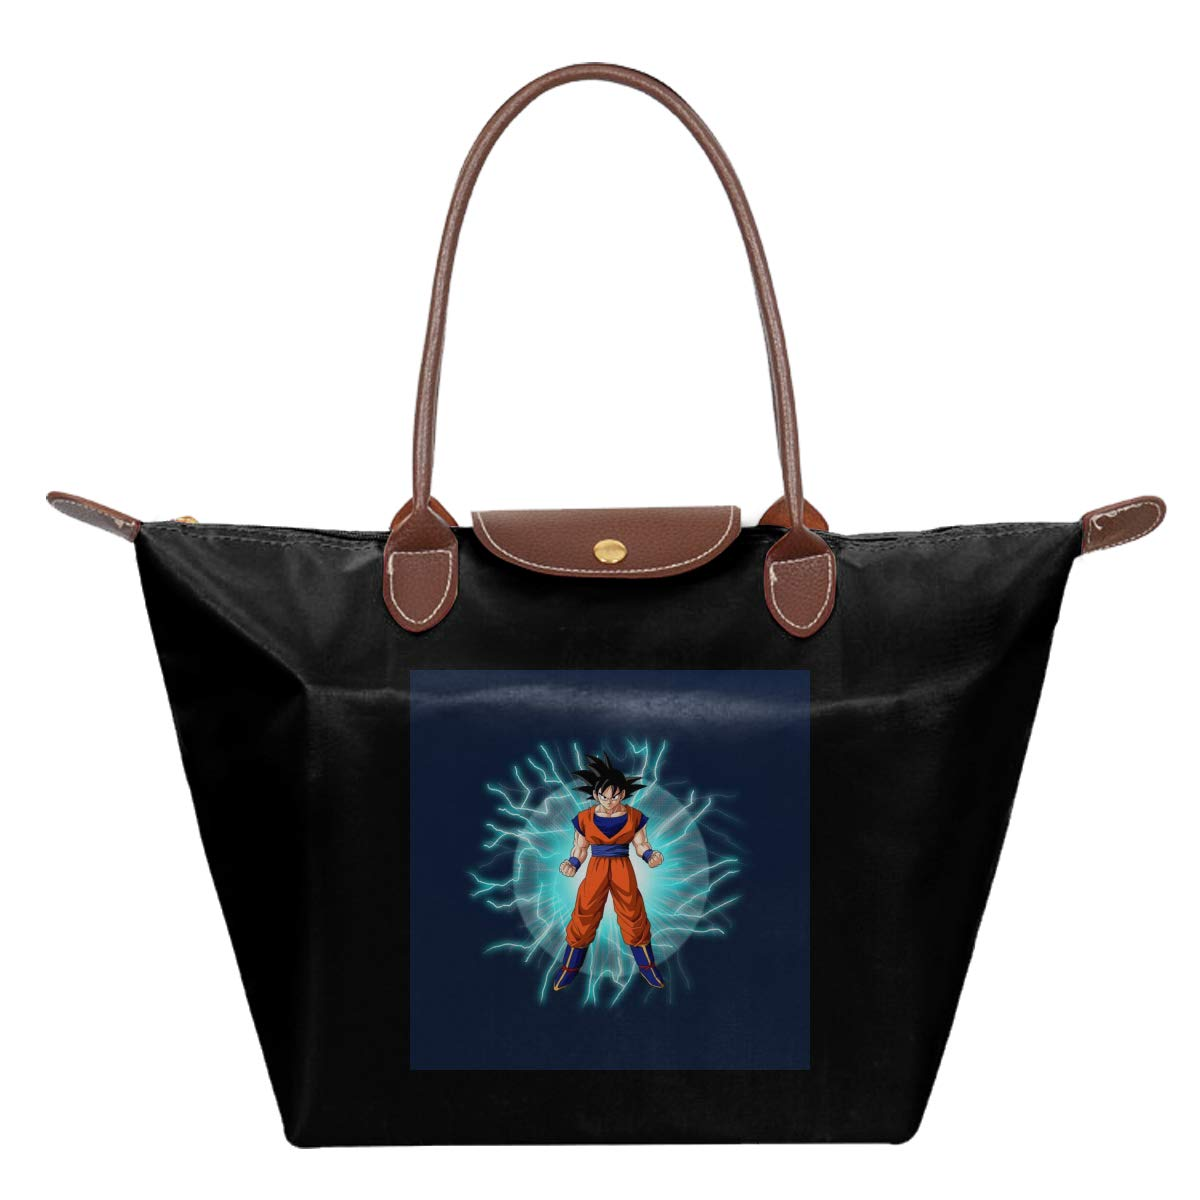 Dragon Ball Z Goku With Lightning Waterproof Leather Folded Messenger Nylon Bag Travel Tote Hopping Folding School Handbags